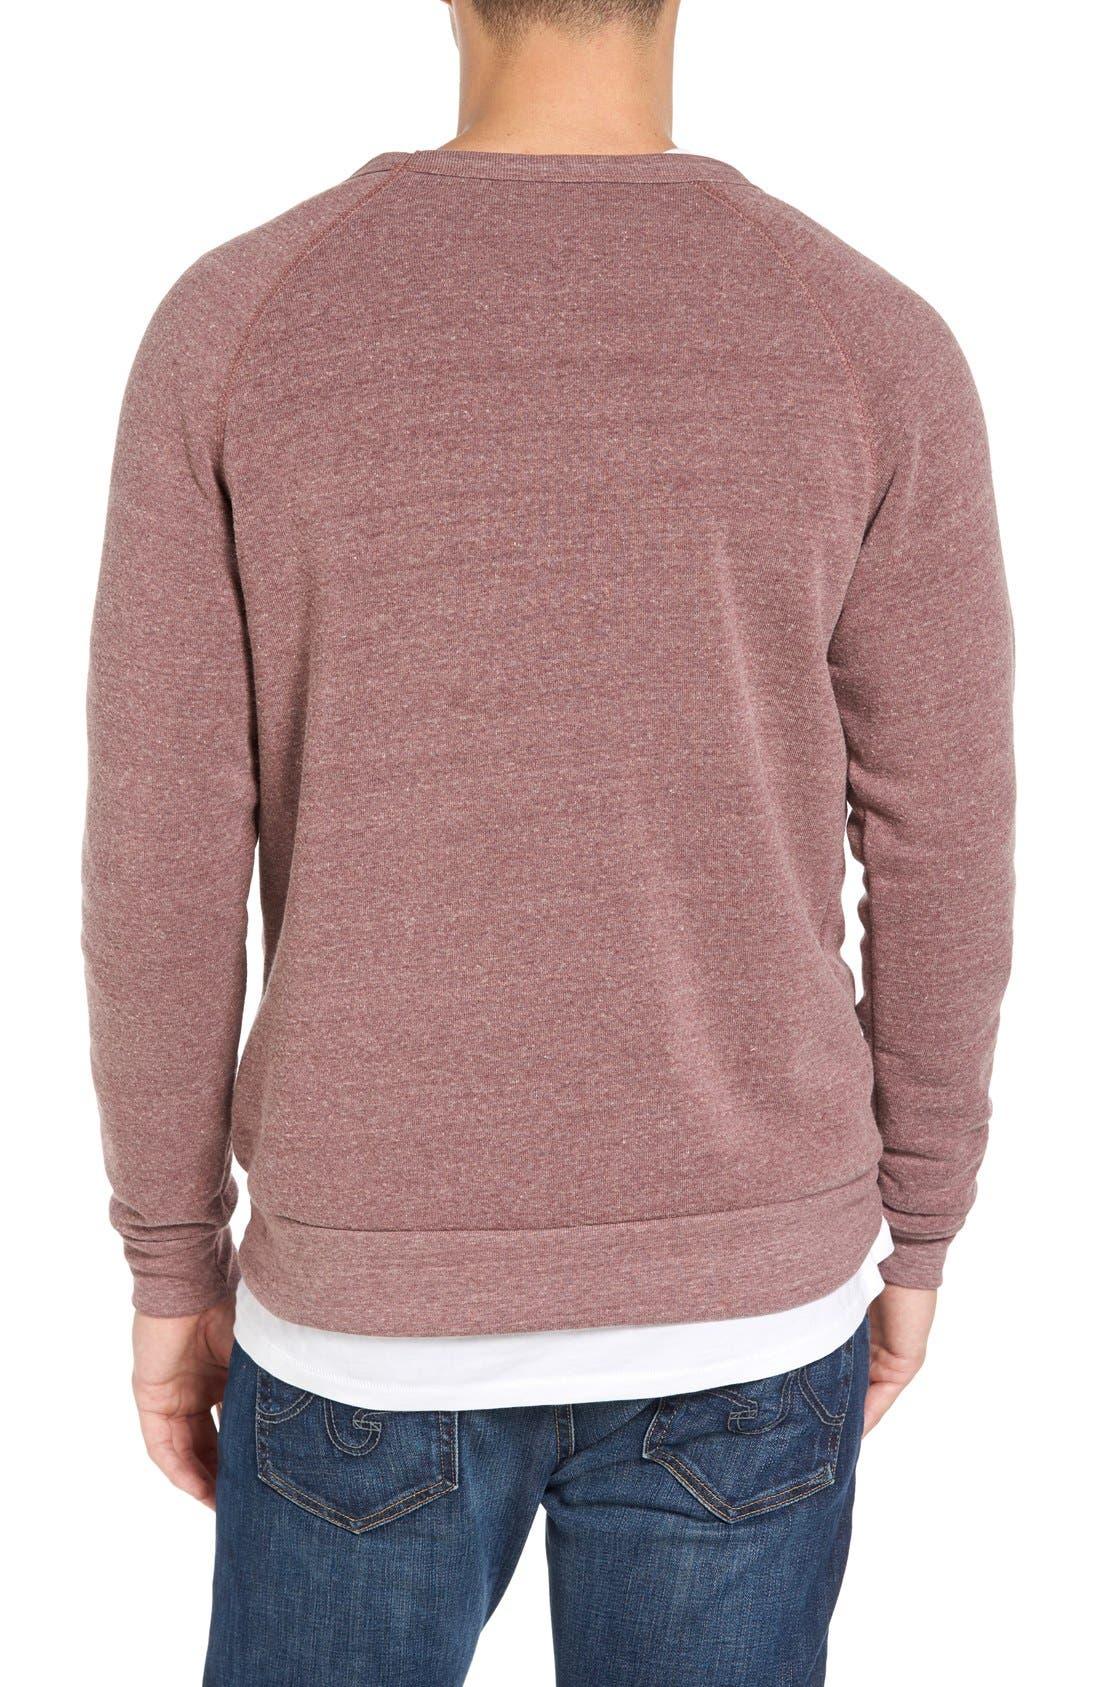 'The Champ' Sweatshirt,                             Alternate thumbnail 26, color,